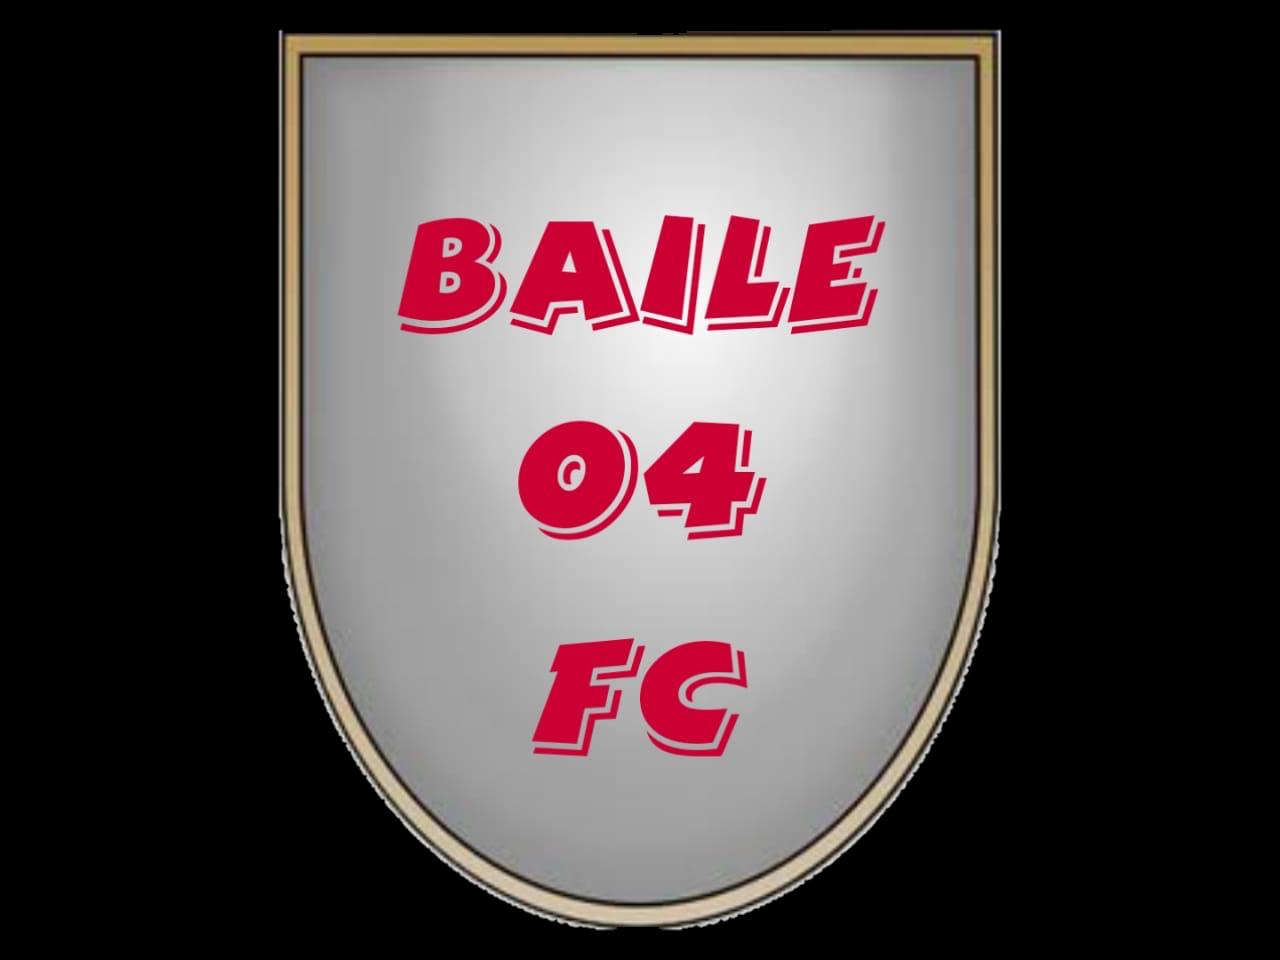 Baile 04